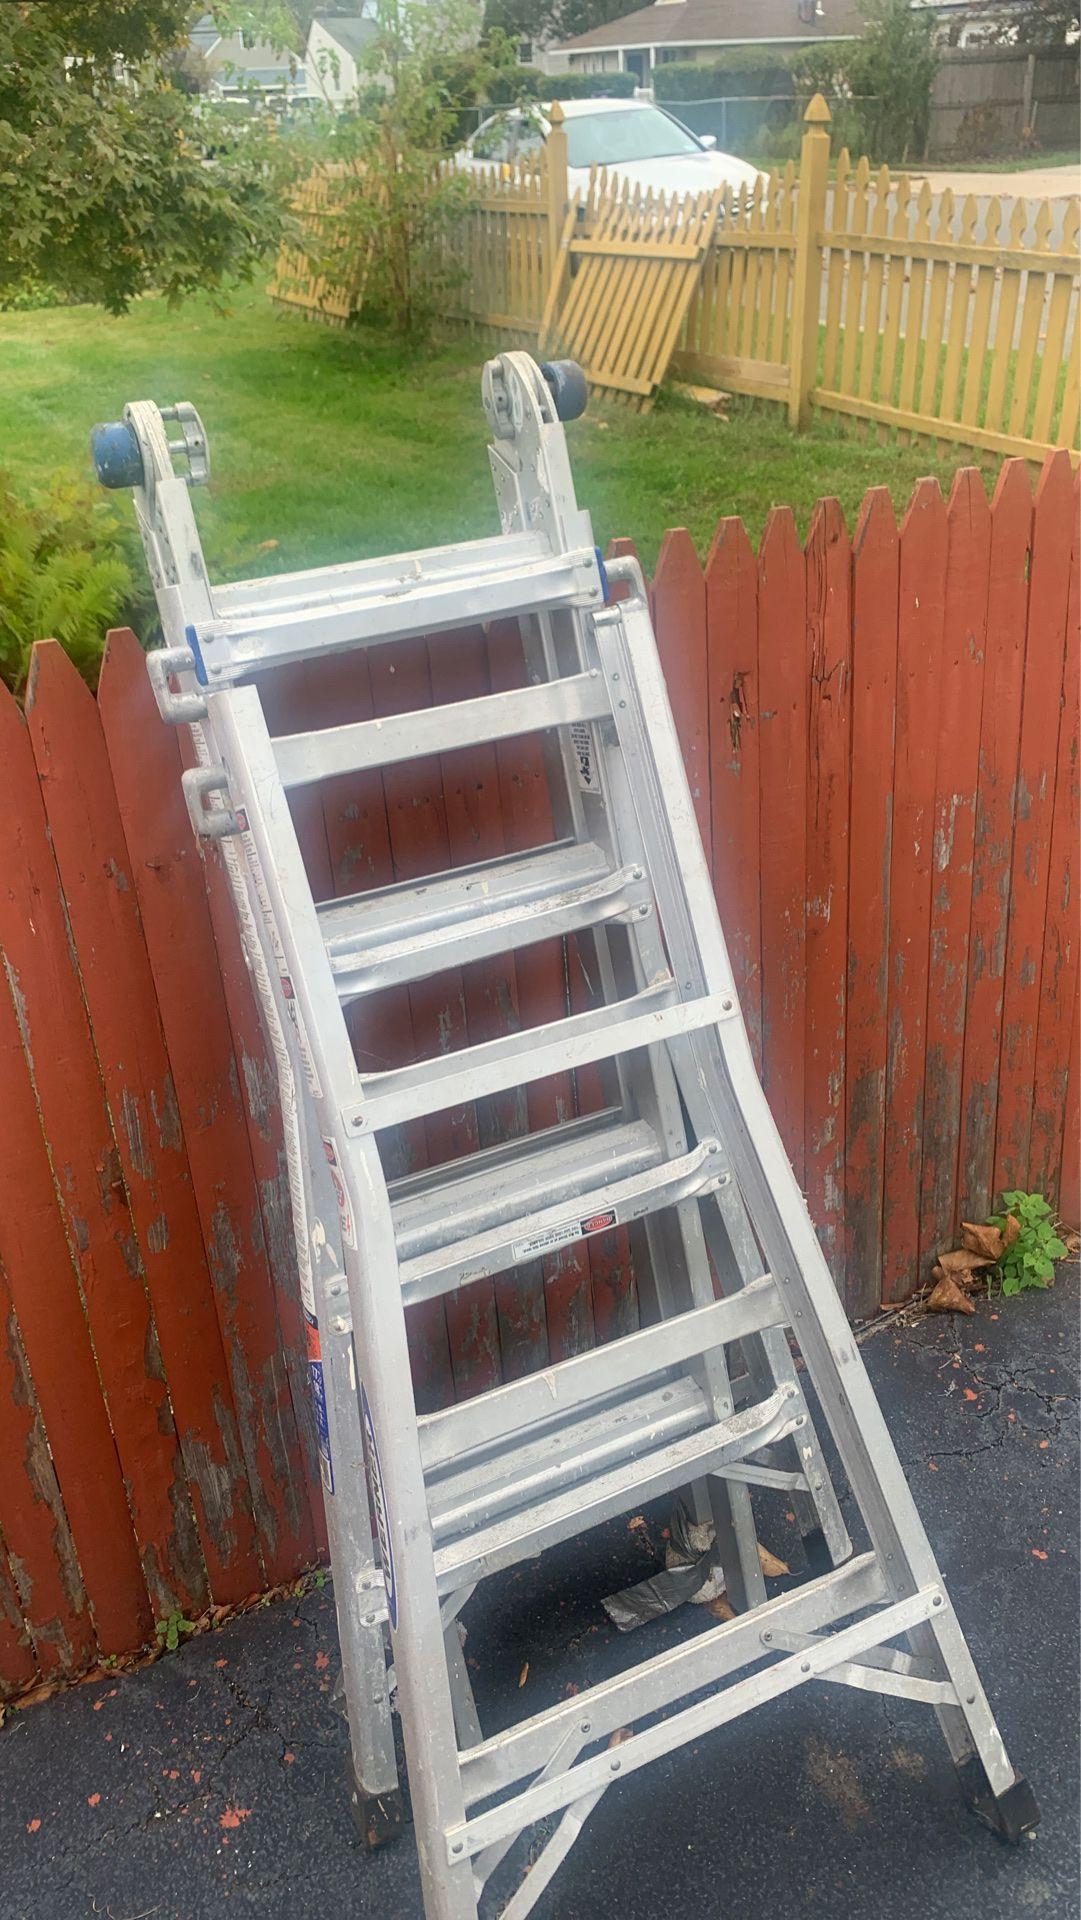 17' ladder